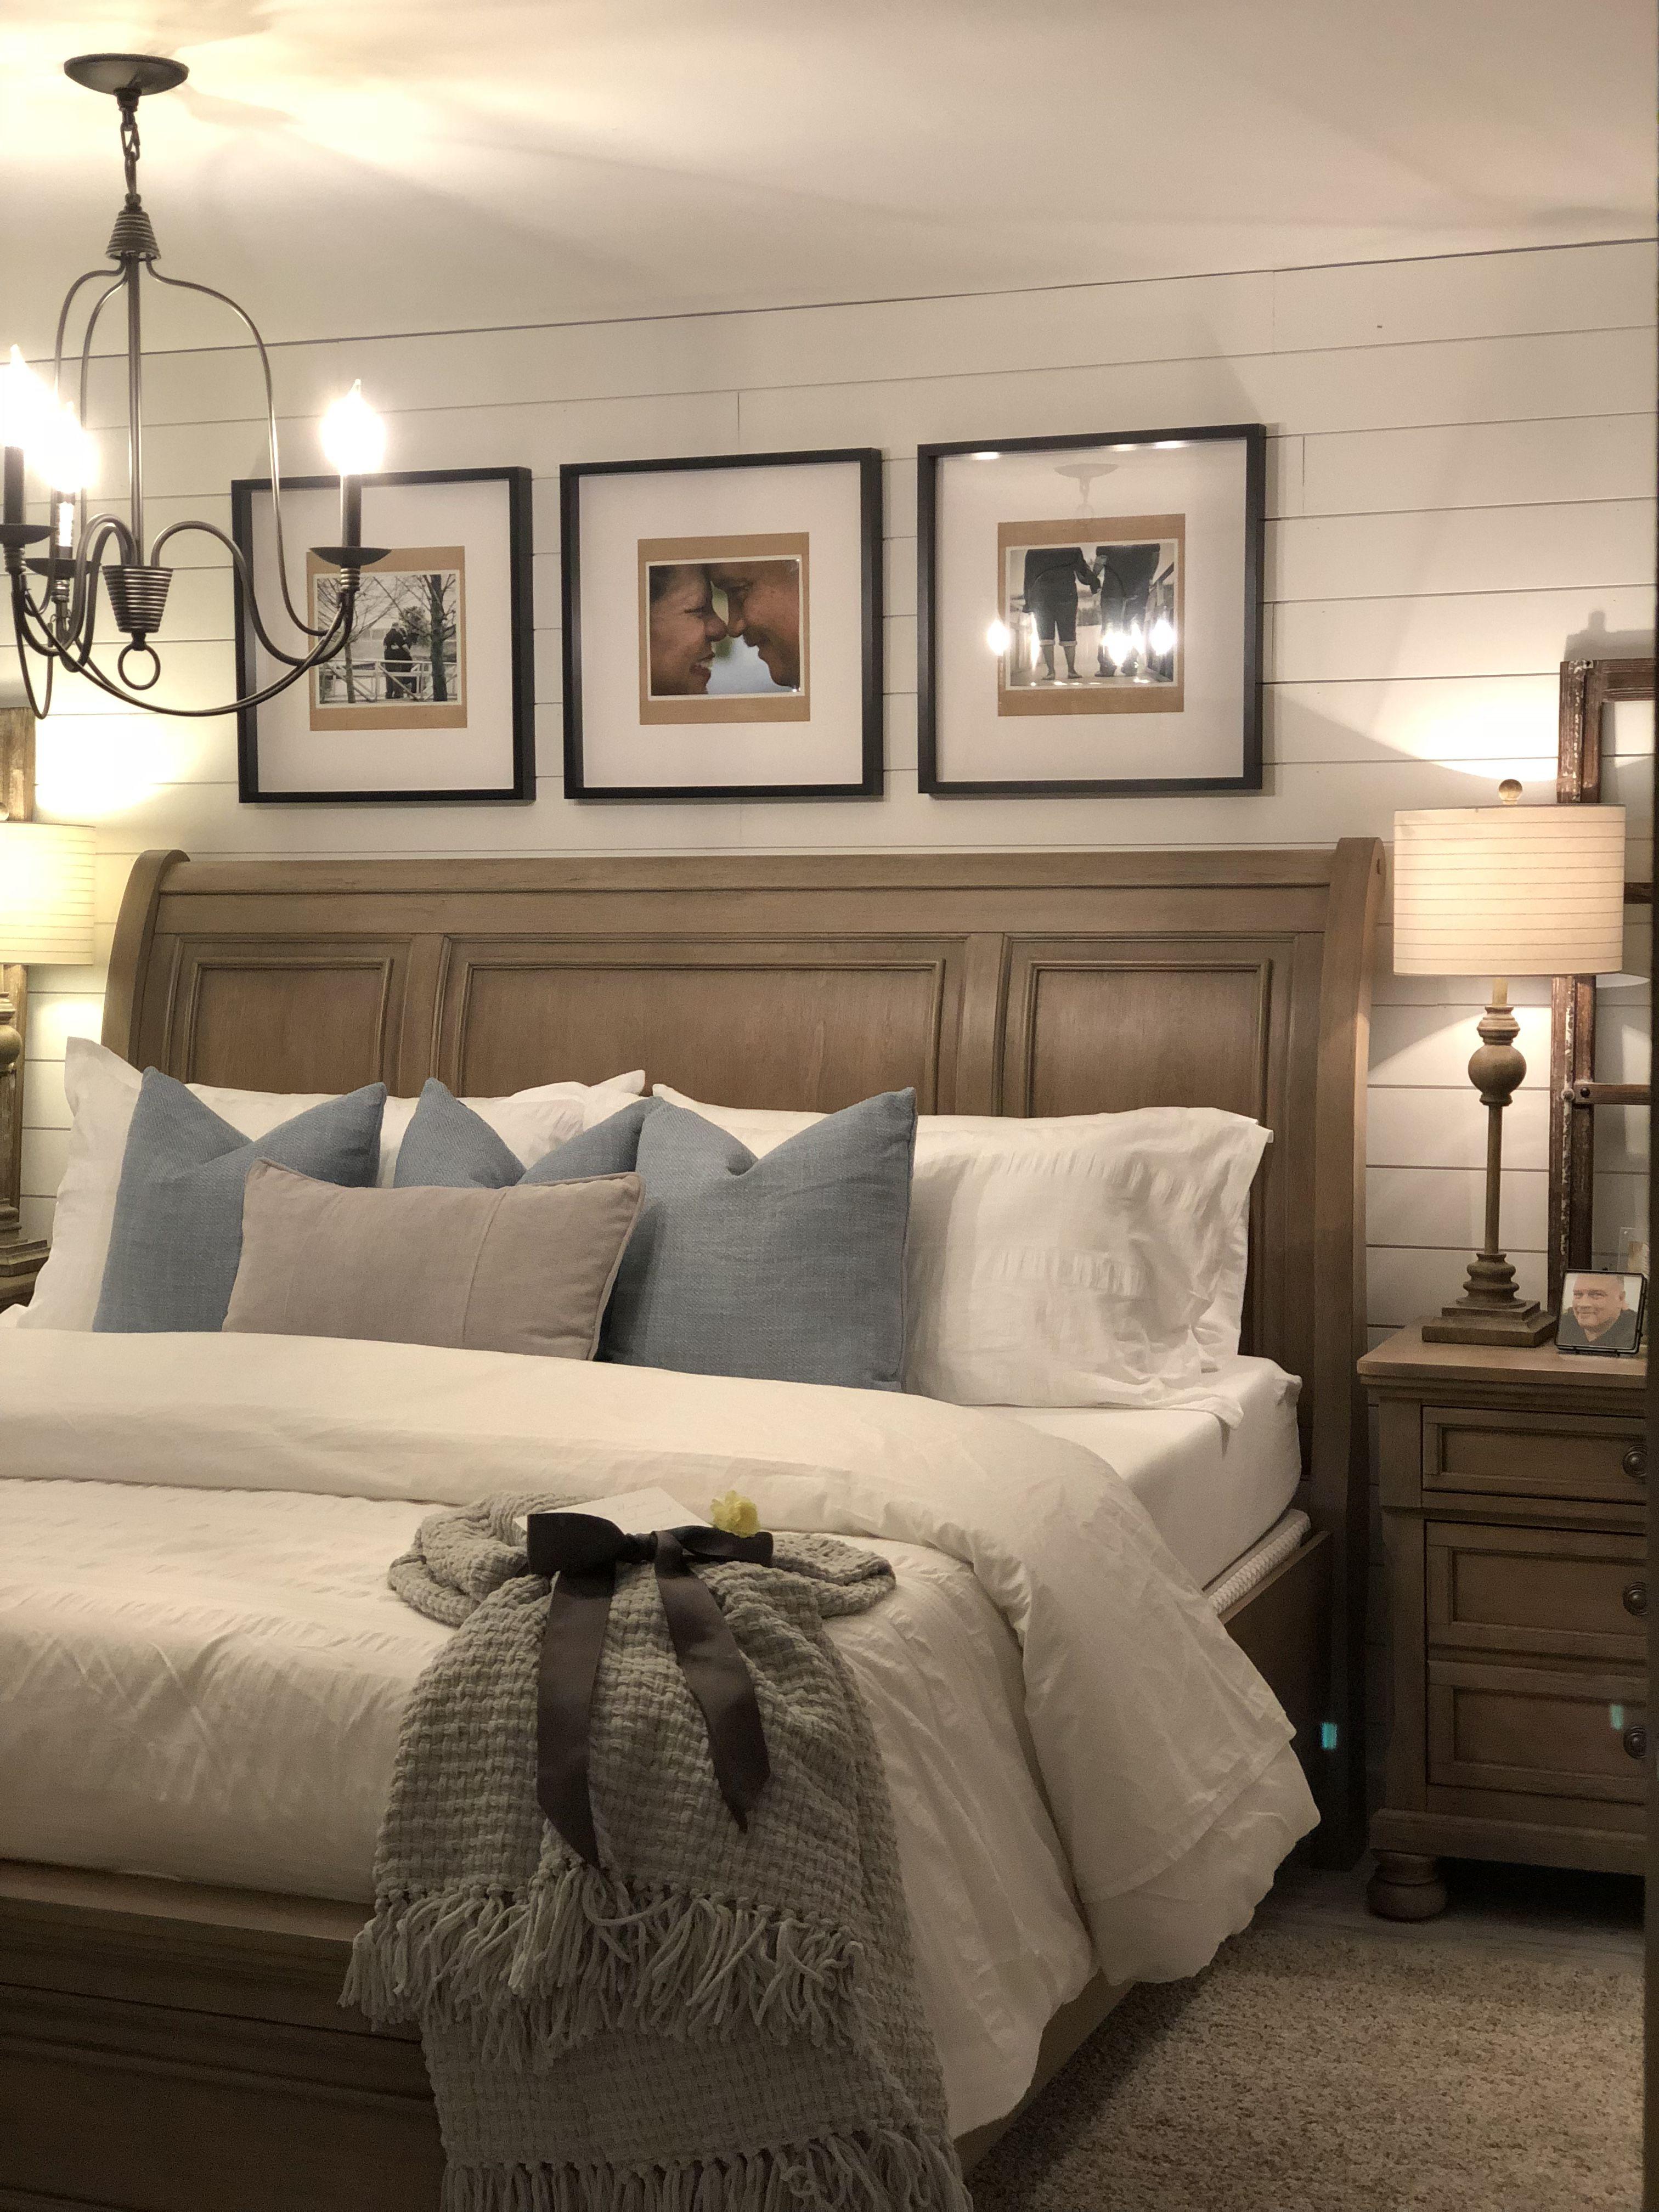 farmhouse master bedroom contact rebecca farmhouse on modern farmhouse master bedroom ideas id=37523